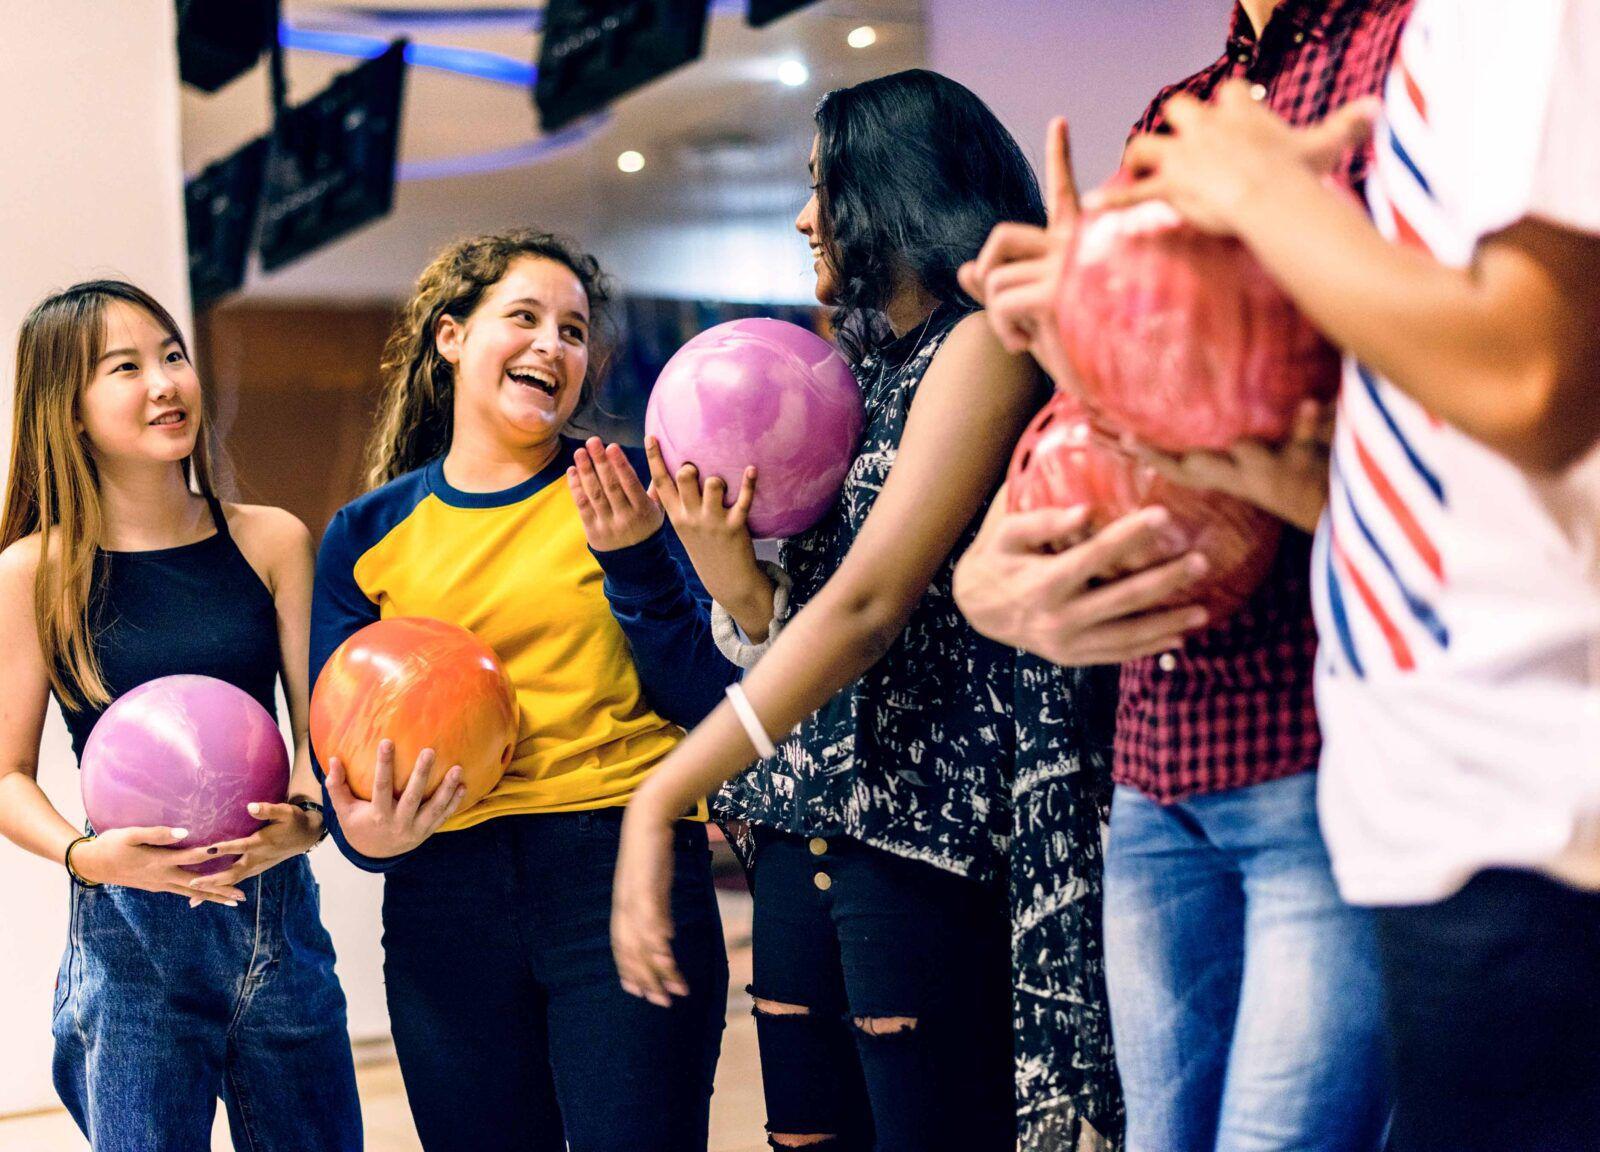 Grupp ungdomar spelar bowling